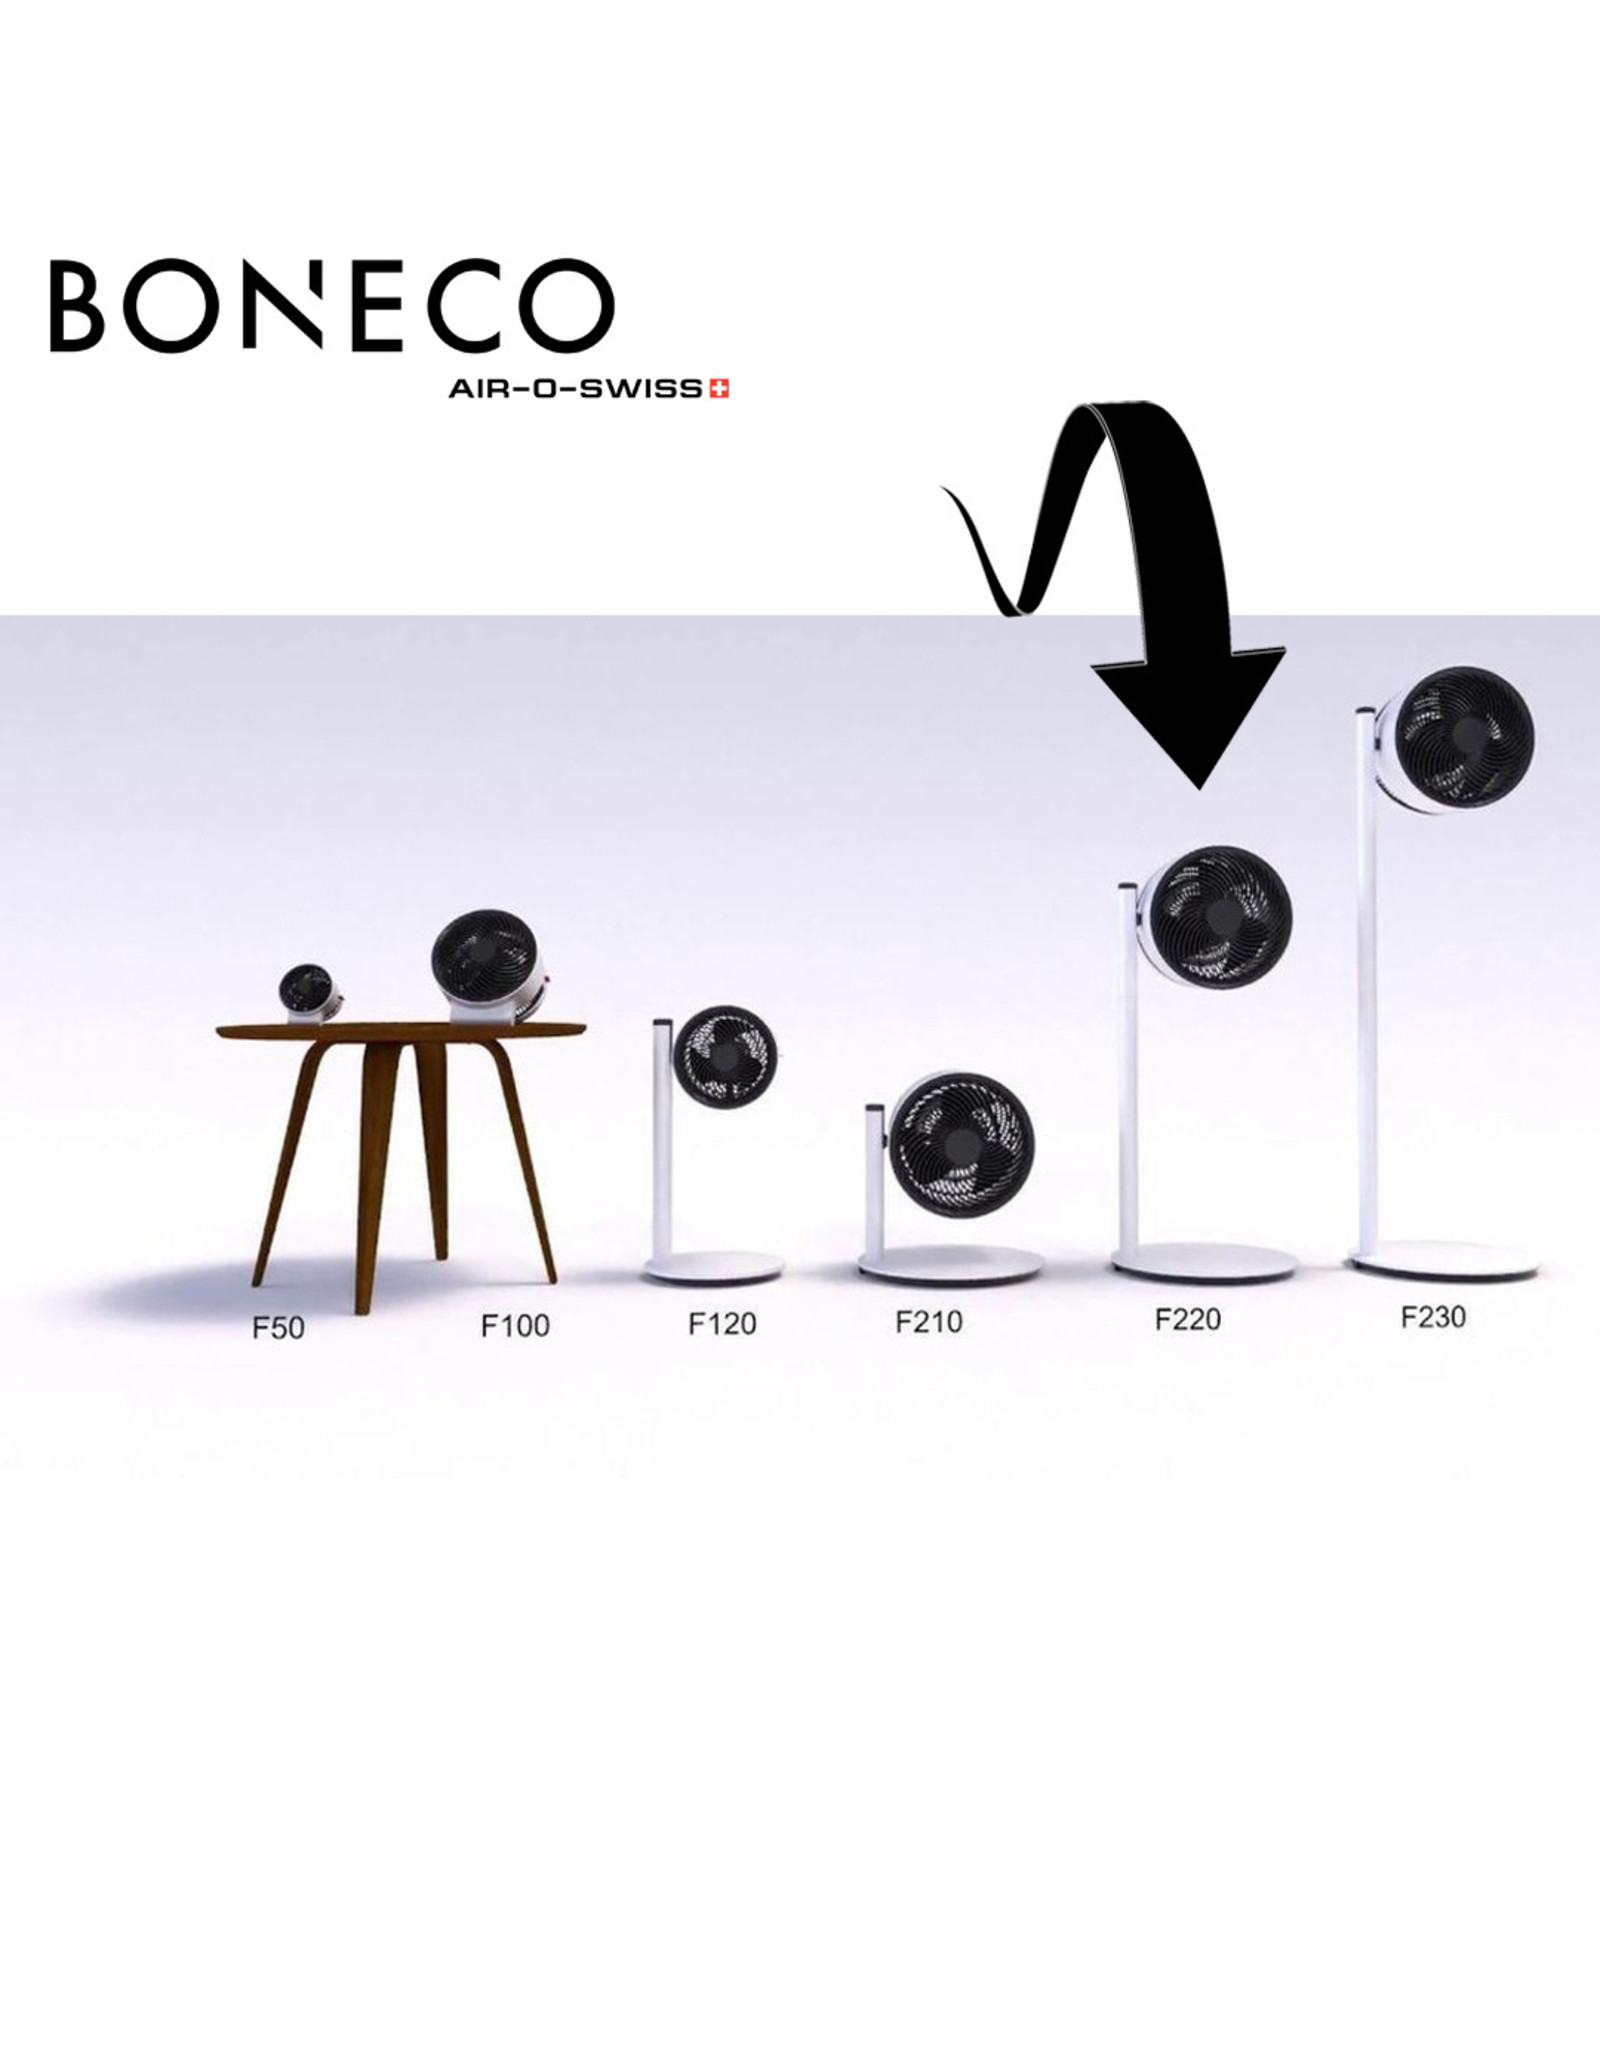 Boneco Boneco Airshower F220